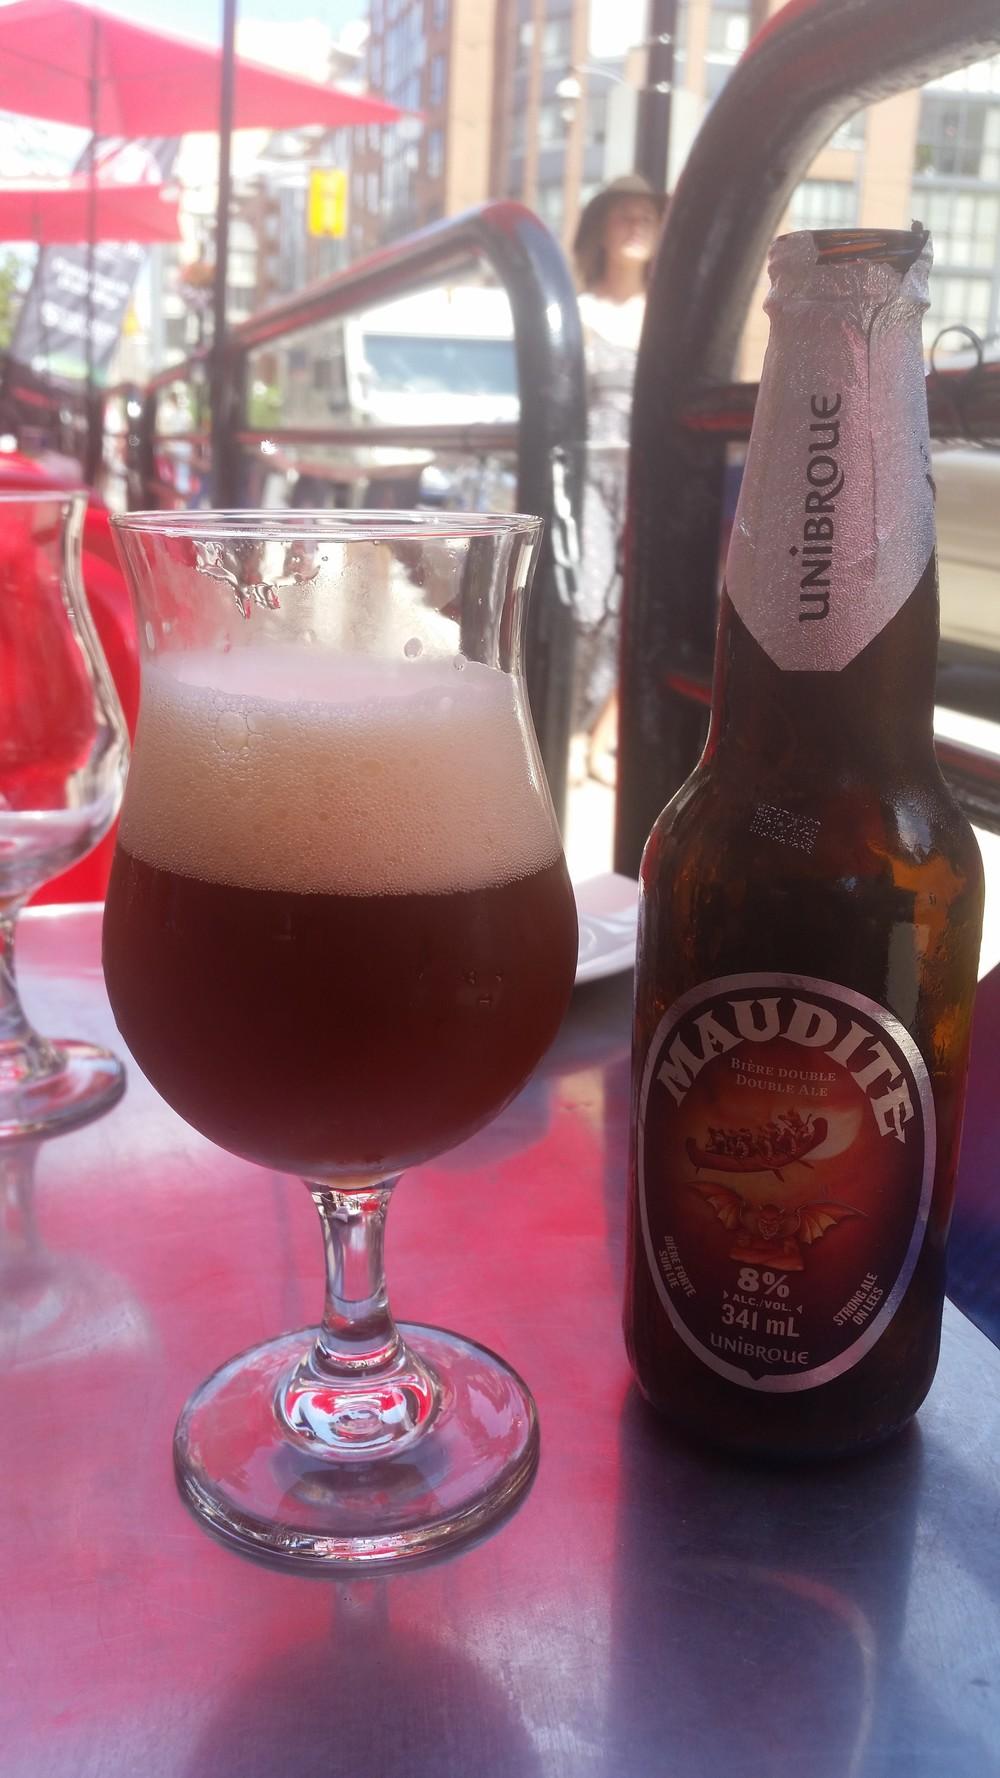 Maudite (Fr: Lanetli) %8 alkollü Belgian Strong Dark Ale, Beeradvoctae puanı 93